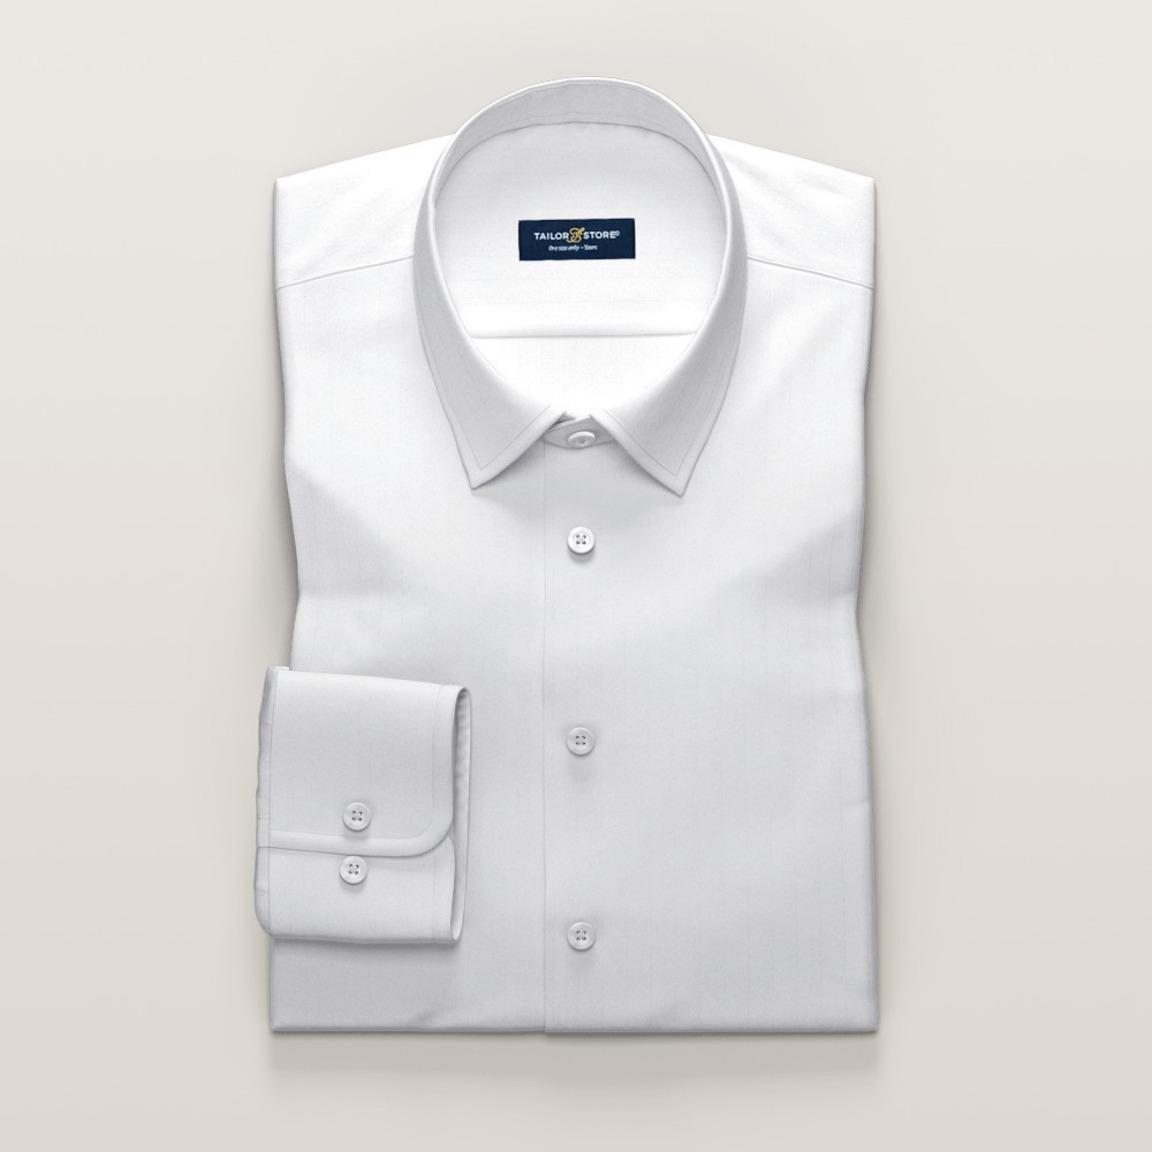 White luxurious business shirt